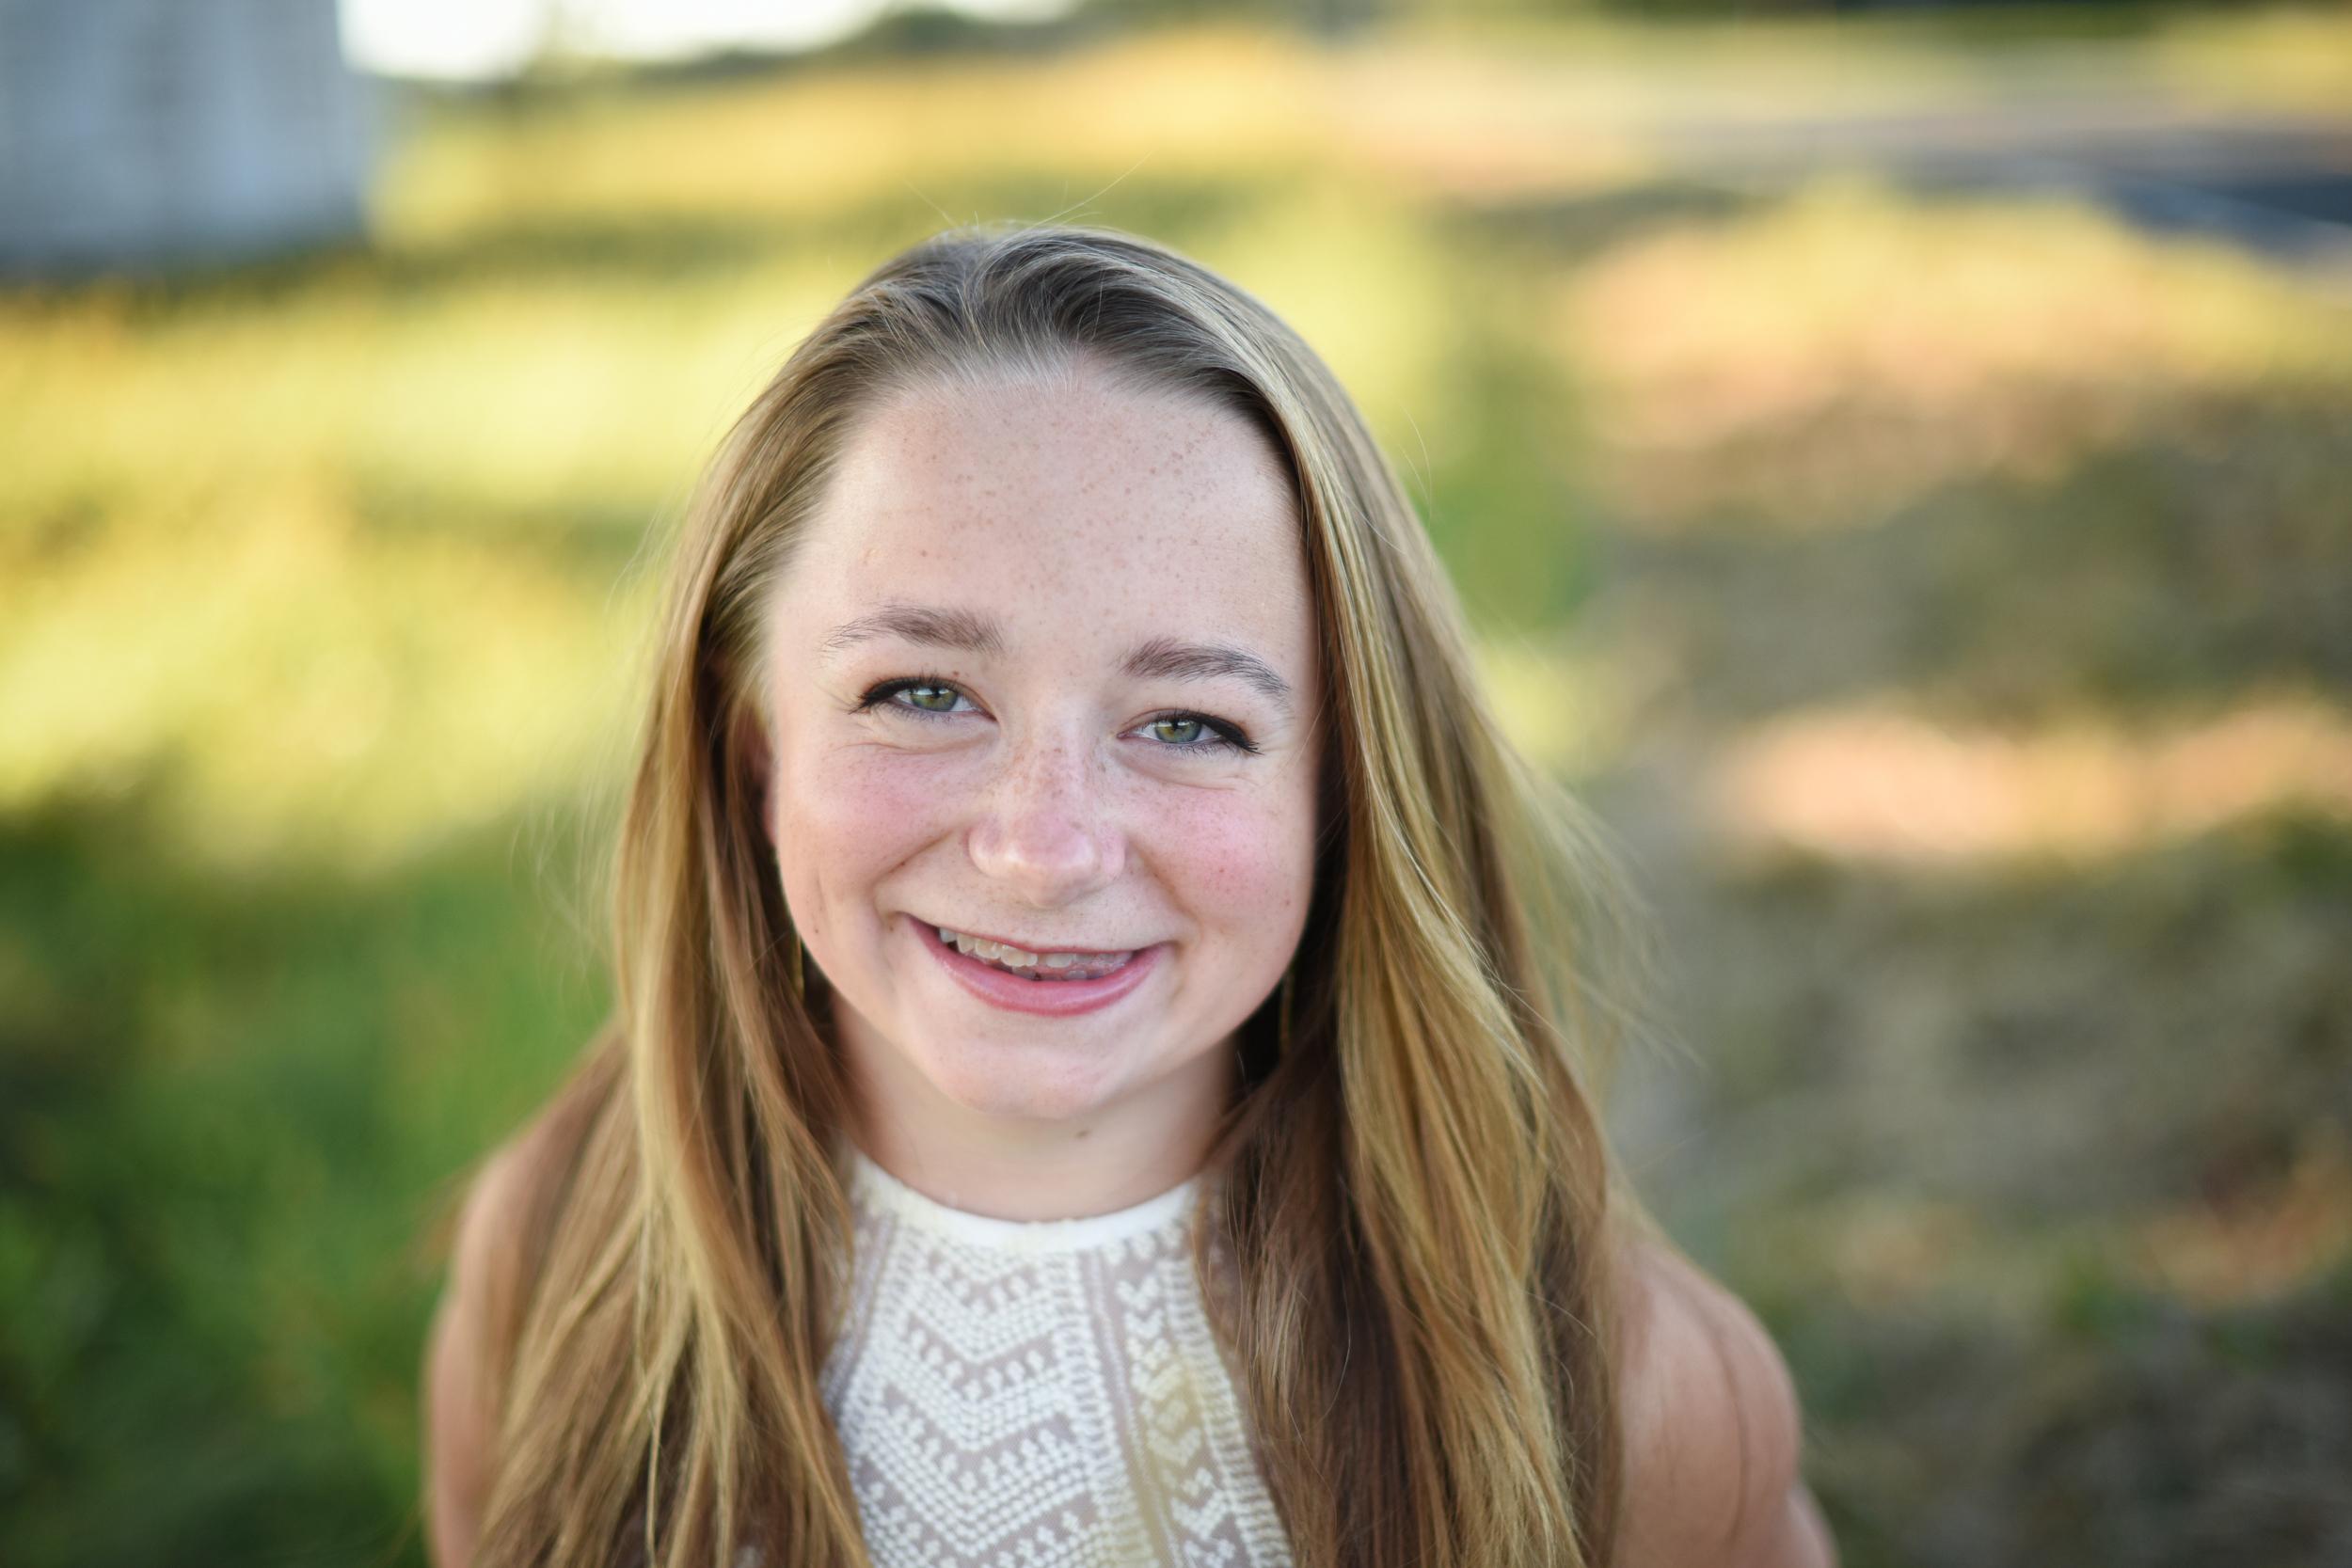 High School Portrait in Amherst